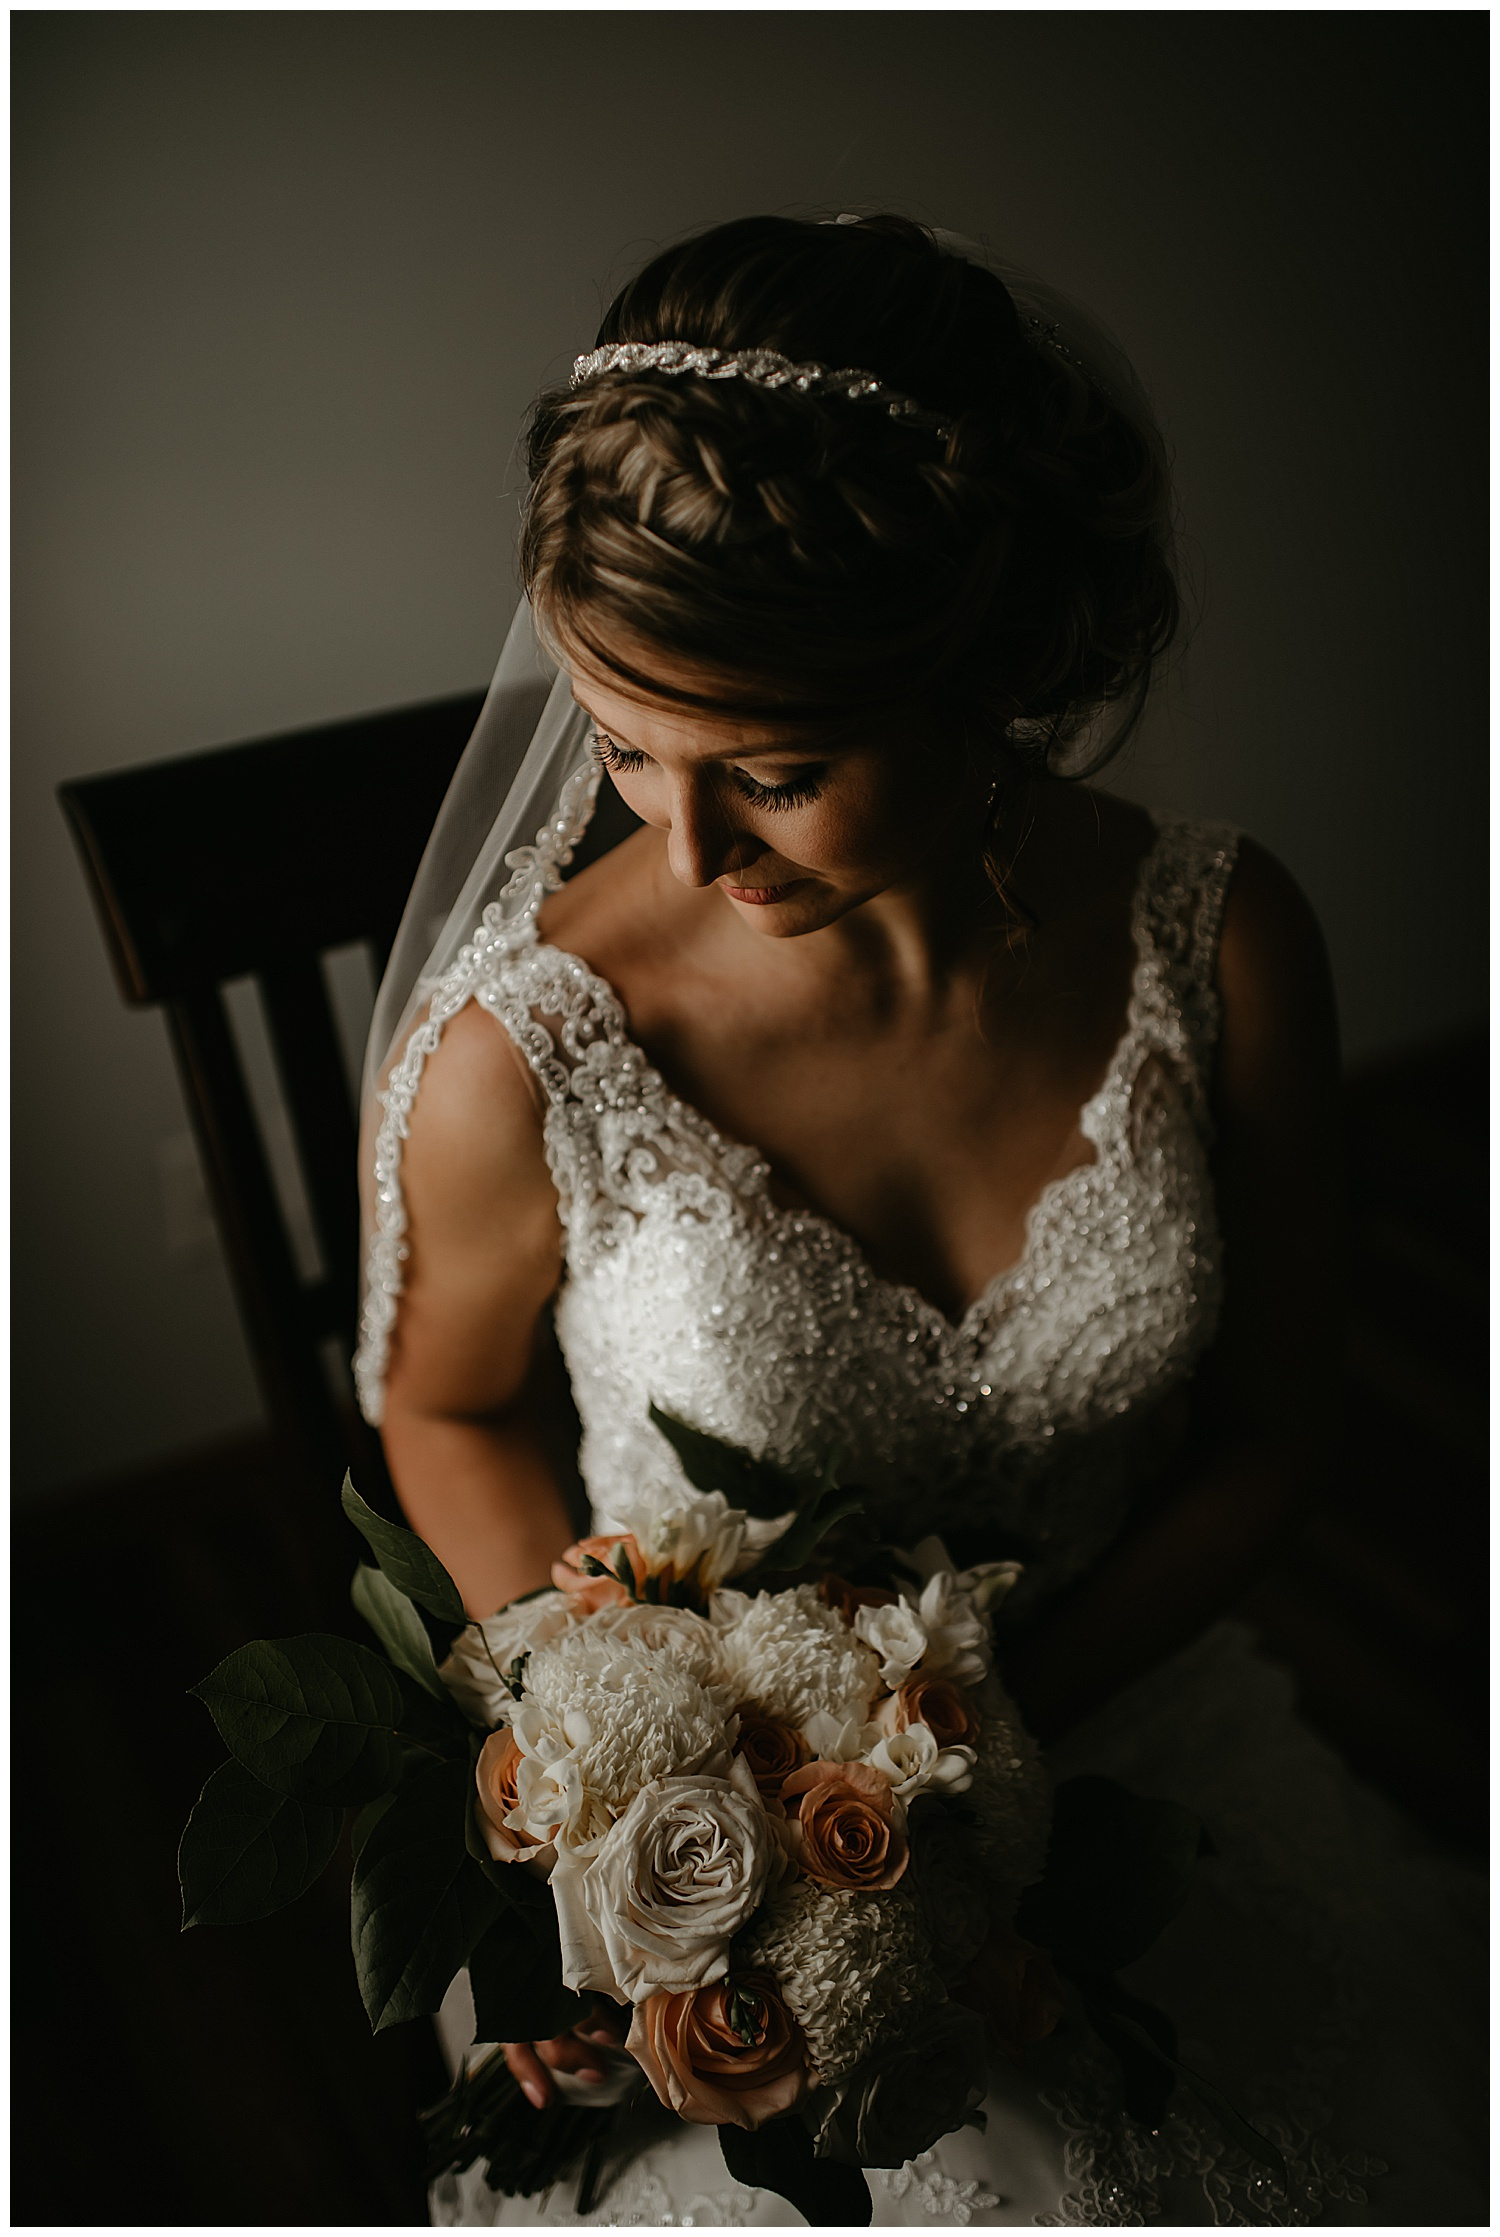 NEPA-Lehigh-Valley-Wedding-Photographer-at-Fountain-Springs-Country-Inn-Ashland-PA_0021.jpg